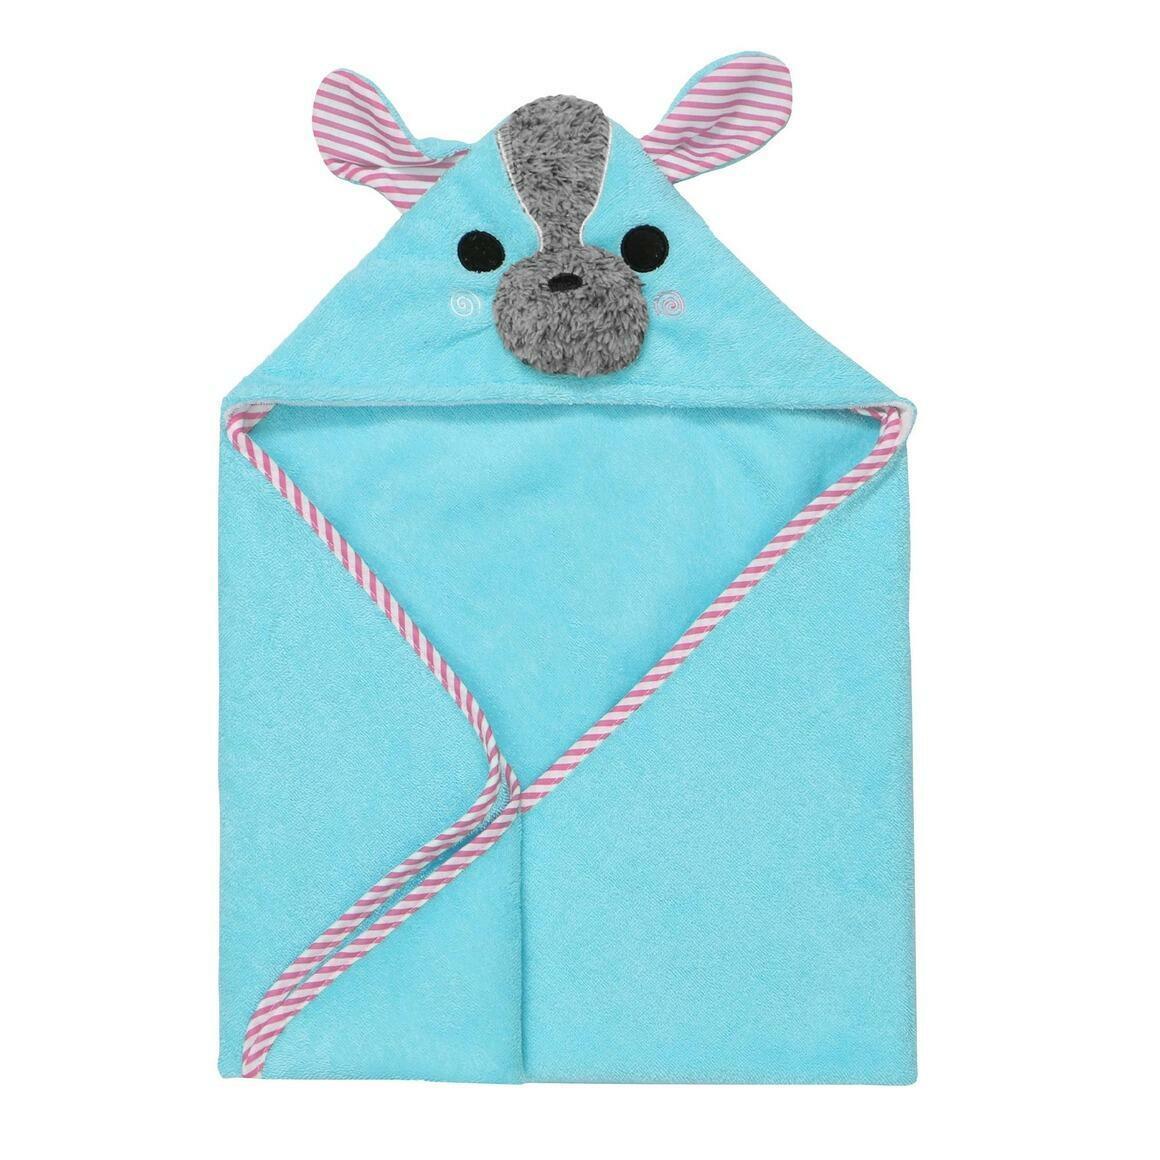 Baby Snow Terry Hooded Bath Towel Yorkie 0-18M | Trada Marketplace